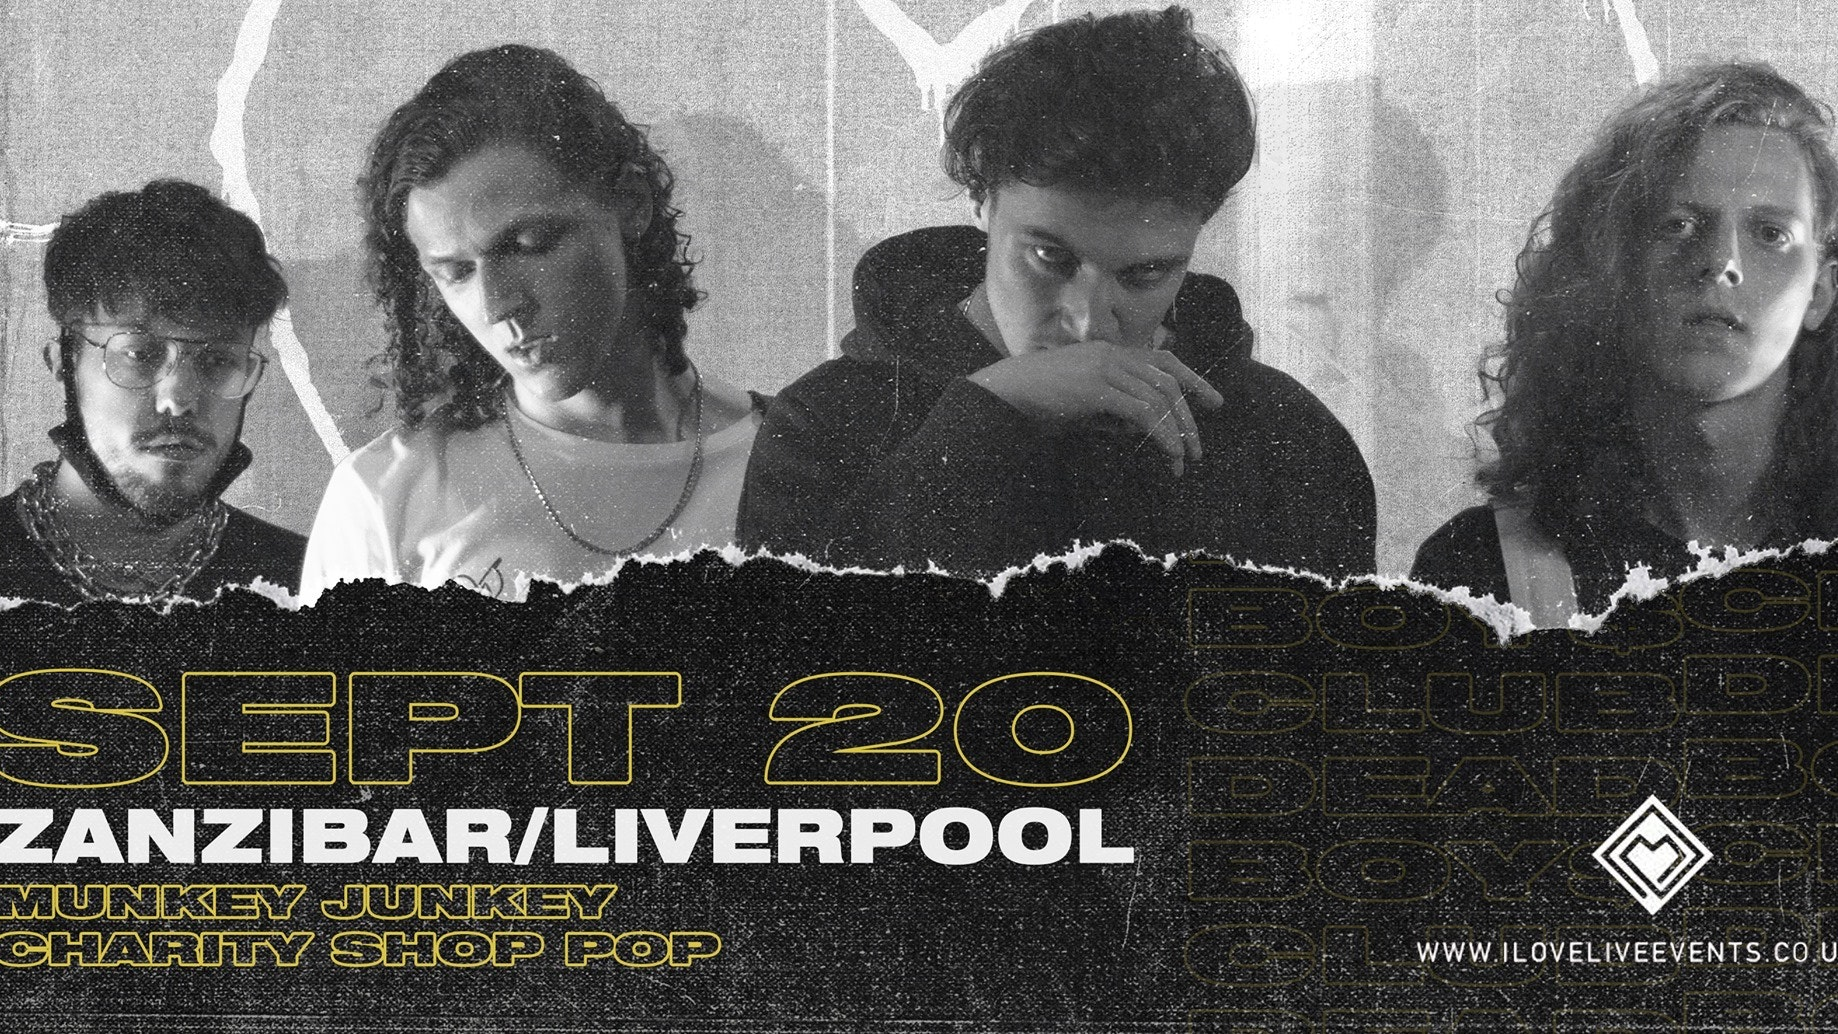 The Post Romantics – Zanzibar, Liverpool – 20/09/19